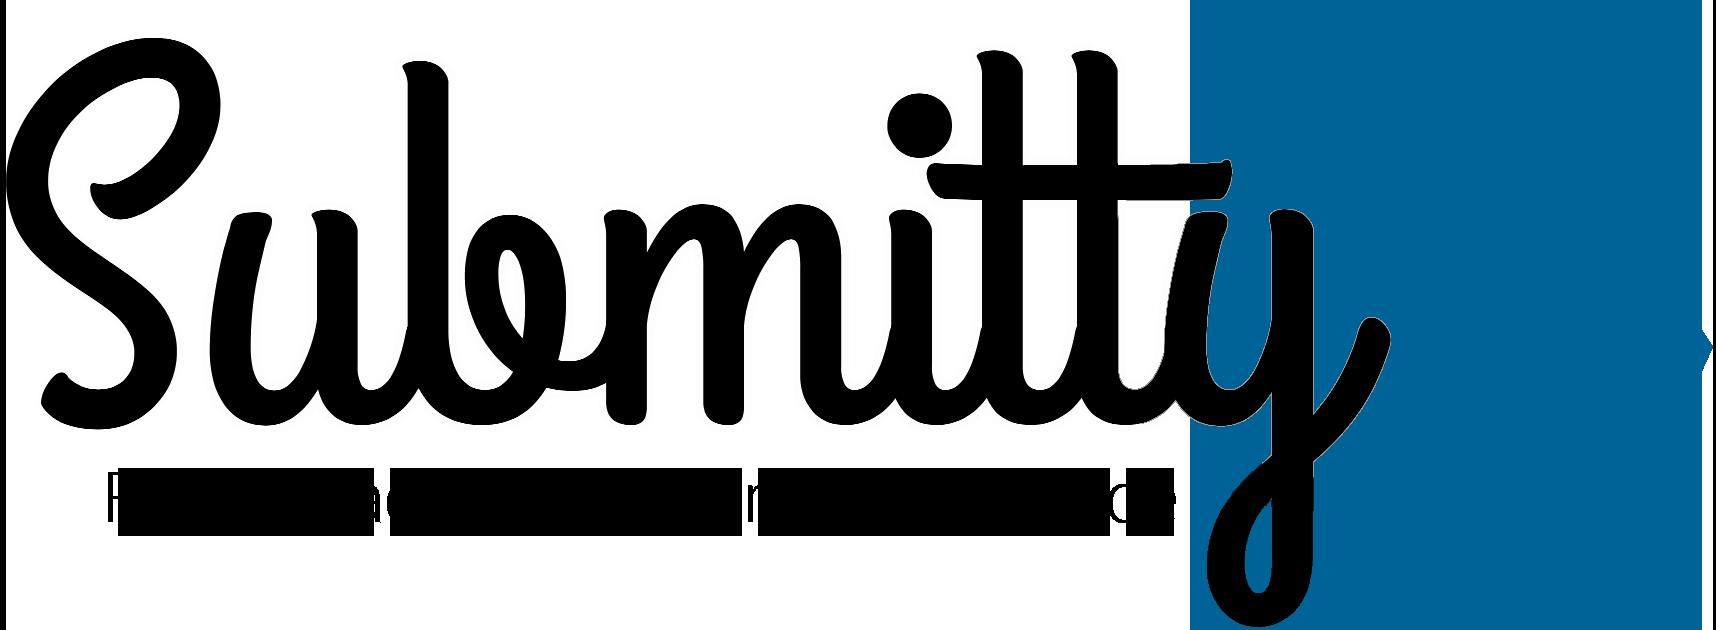 Submitty Logo